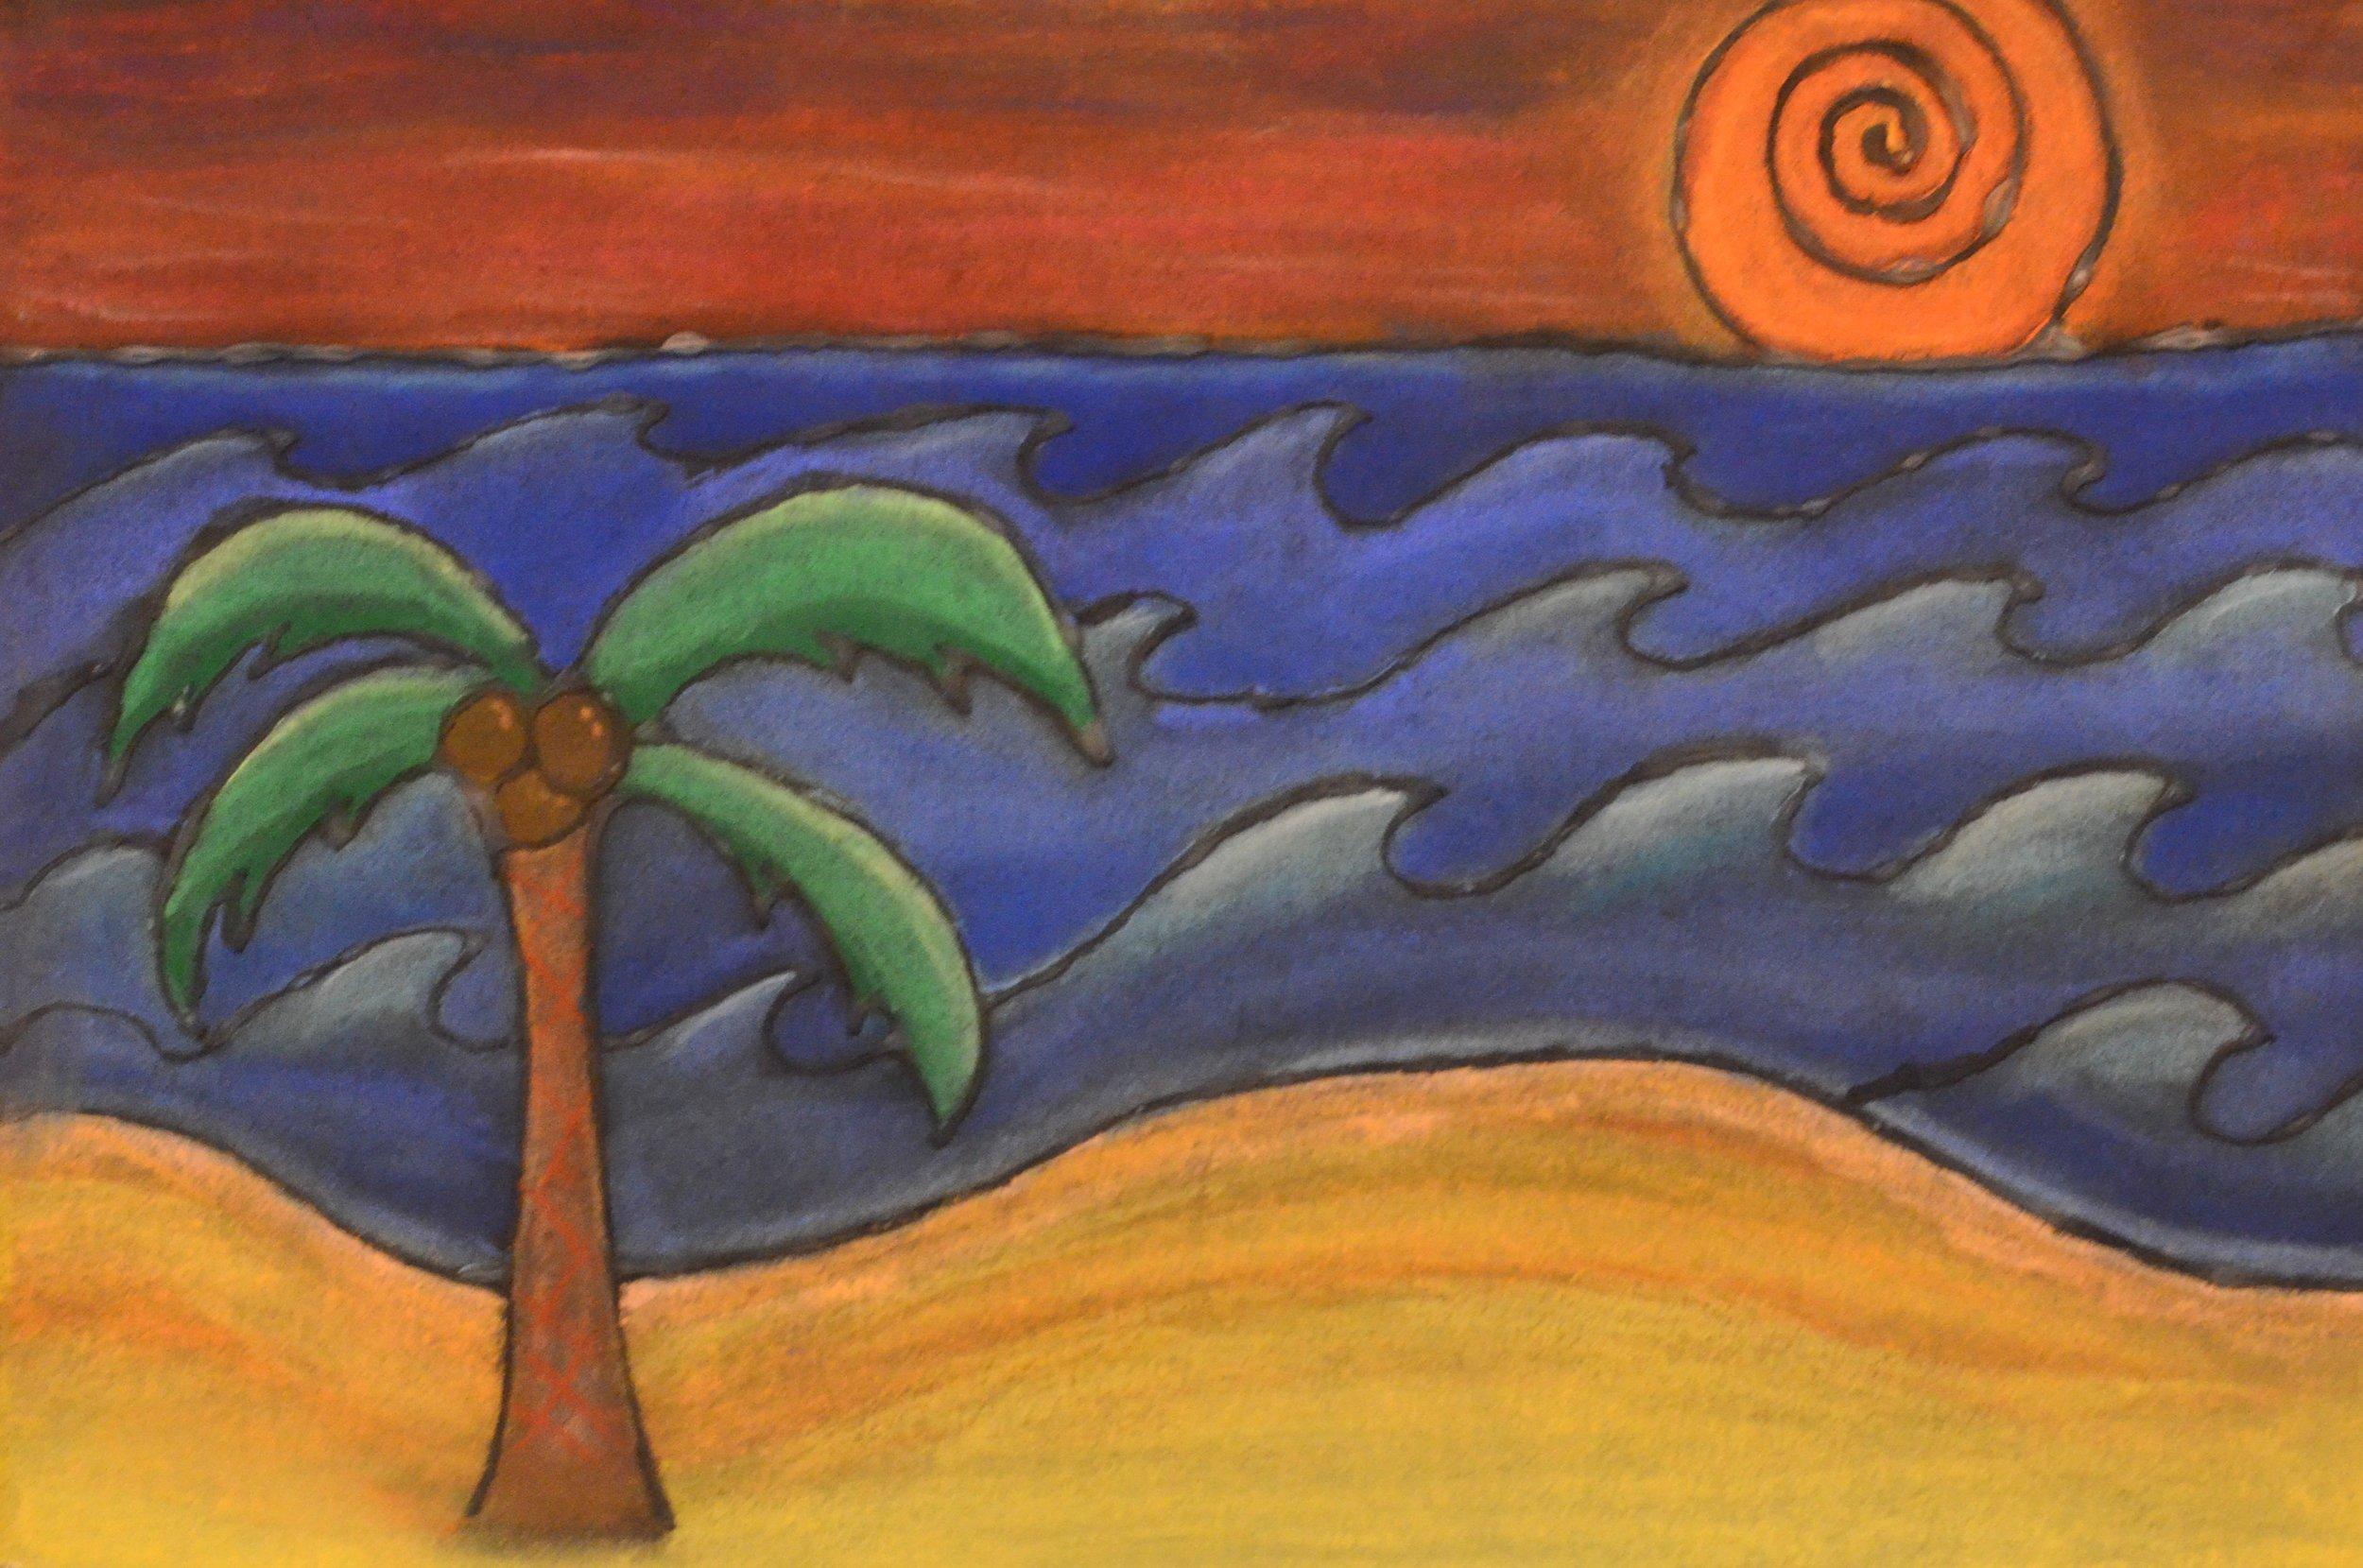 Student artwork on display.